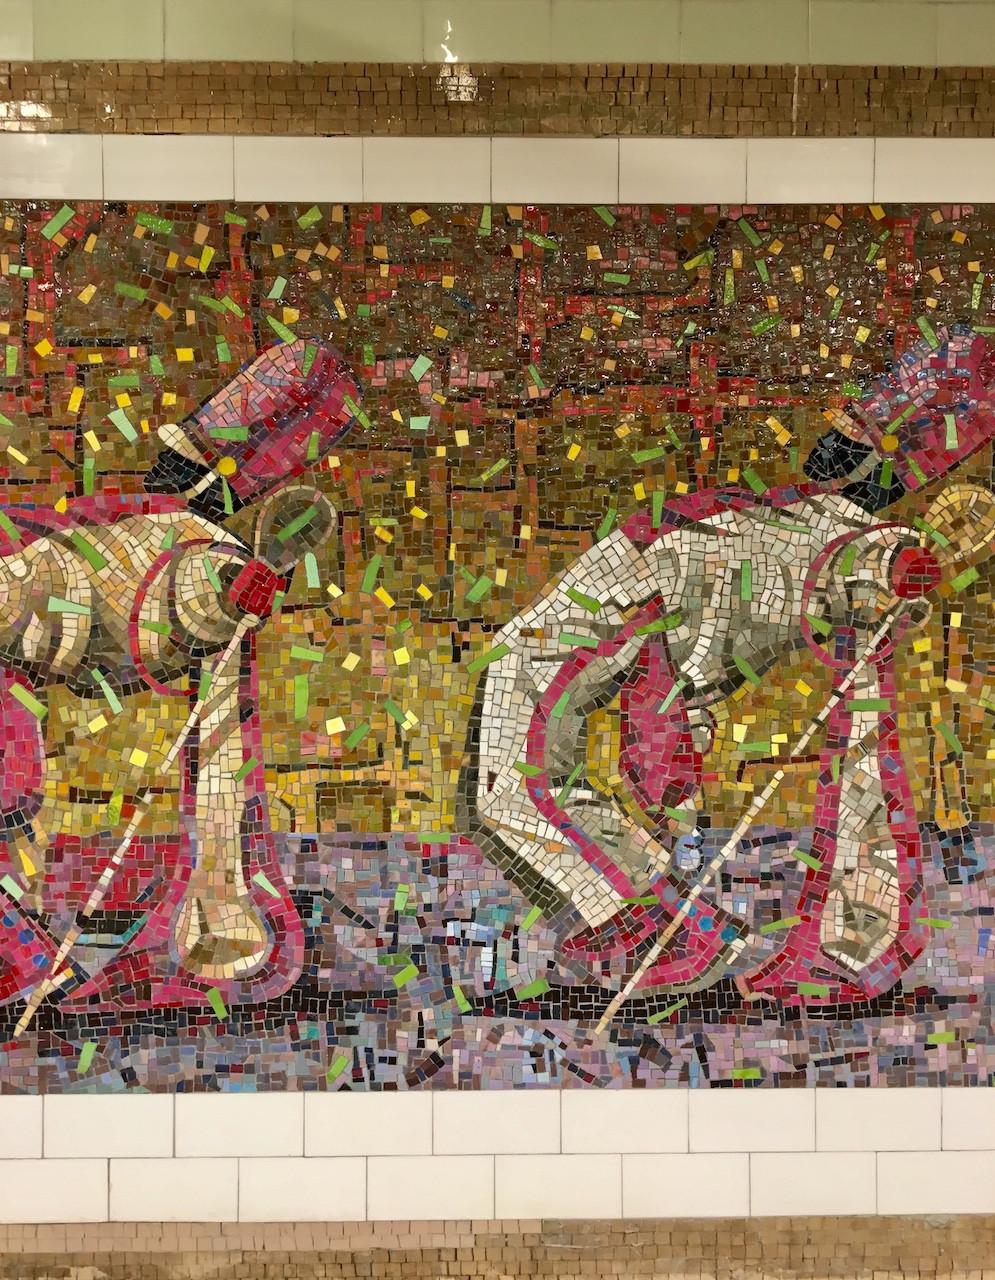 """Parade"" mosaic mural by Derek Fordjour"